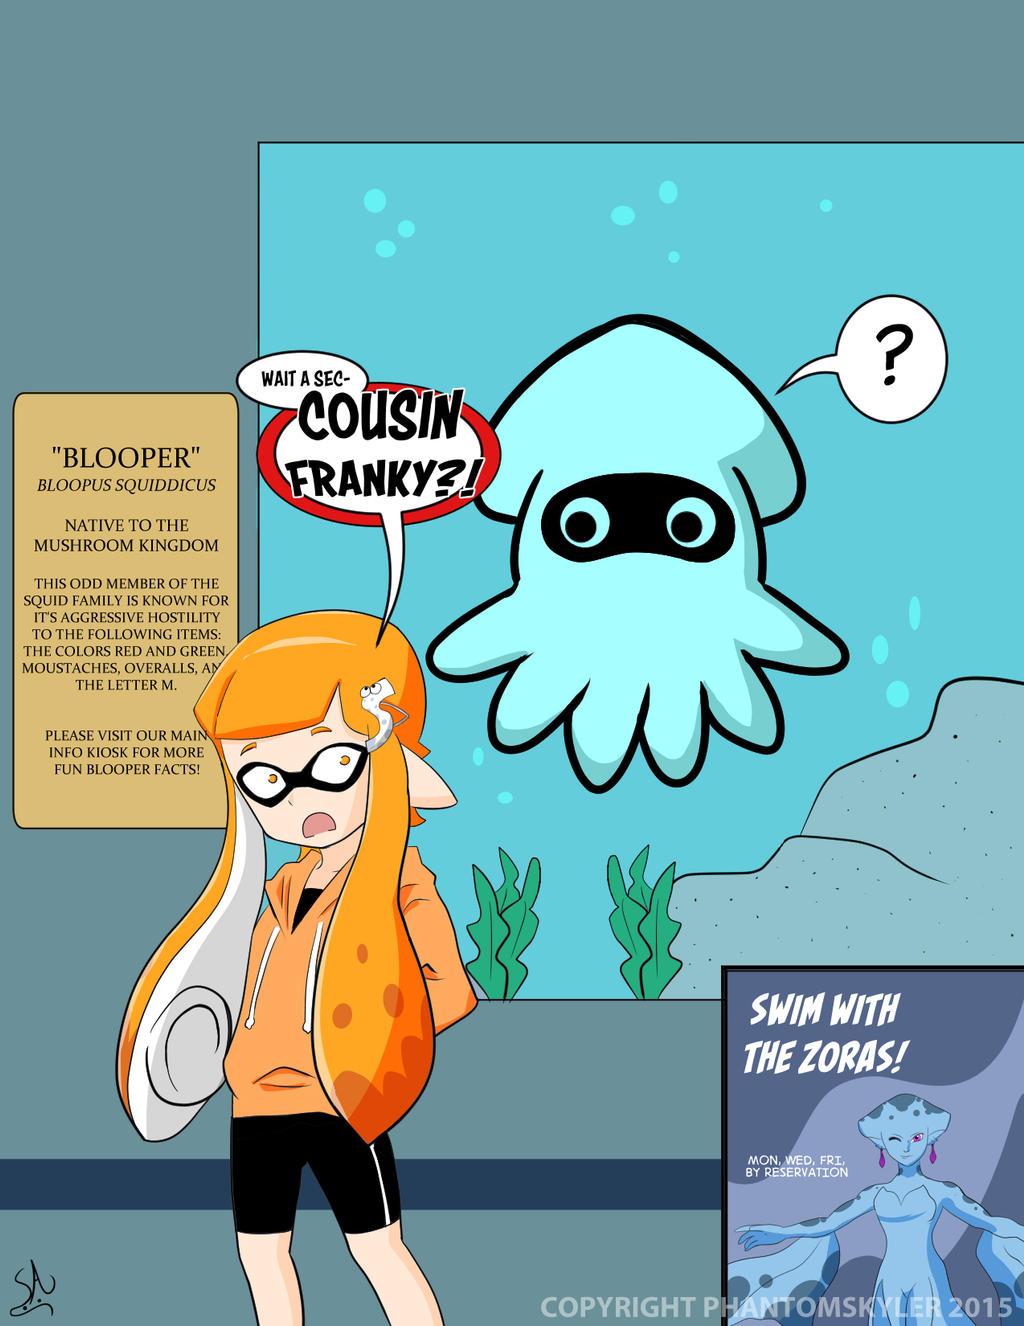 Splatoon - Family Encounter by PhantomSkyler